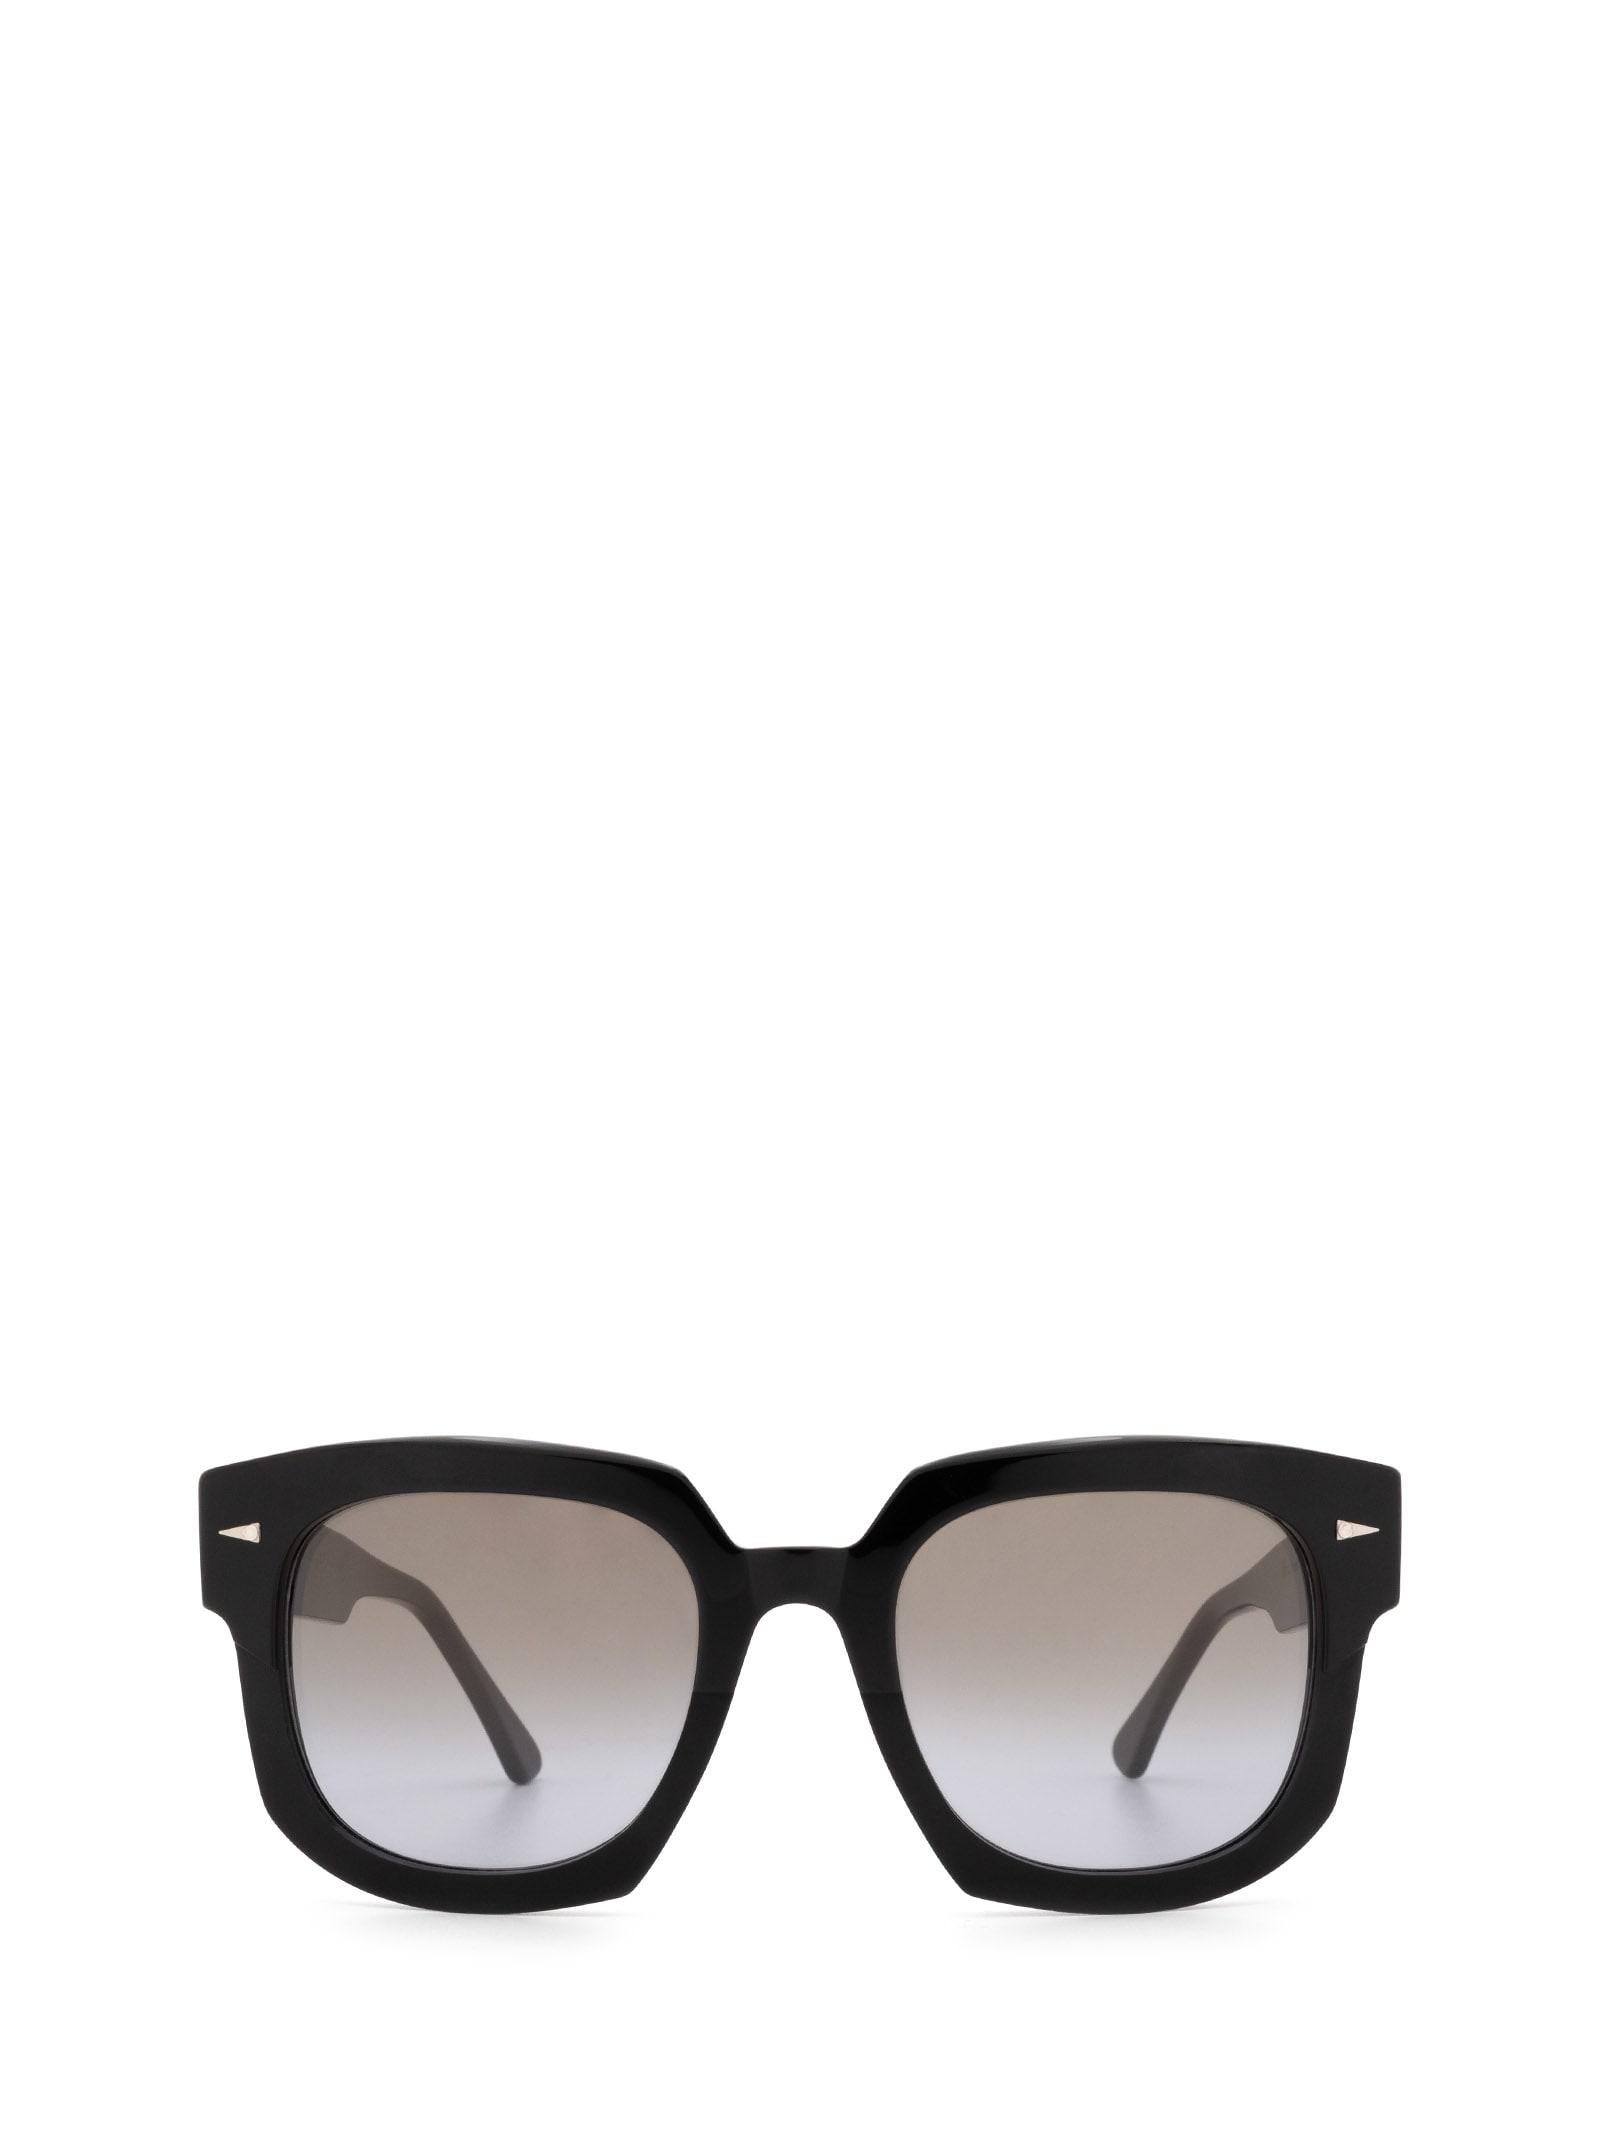 AHLEM Ahlem Vivienne Black Sunglasses